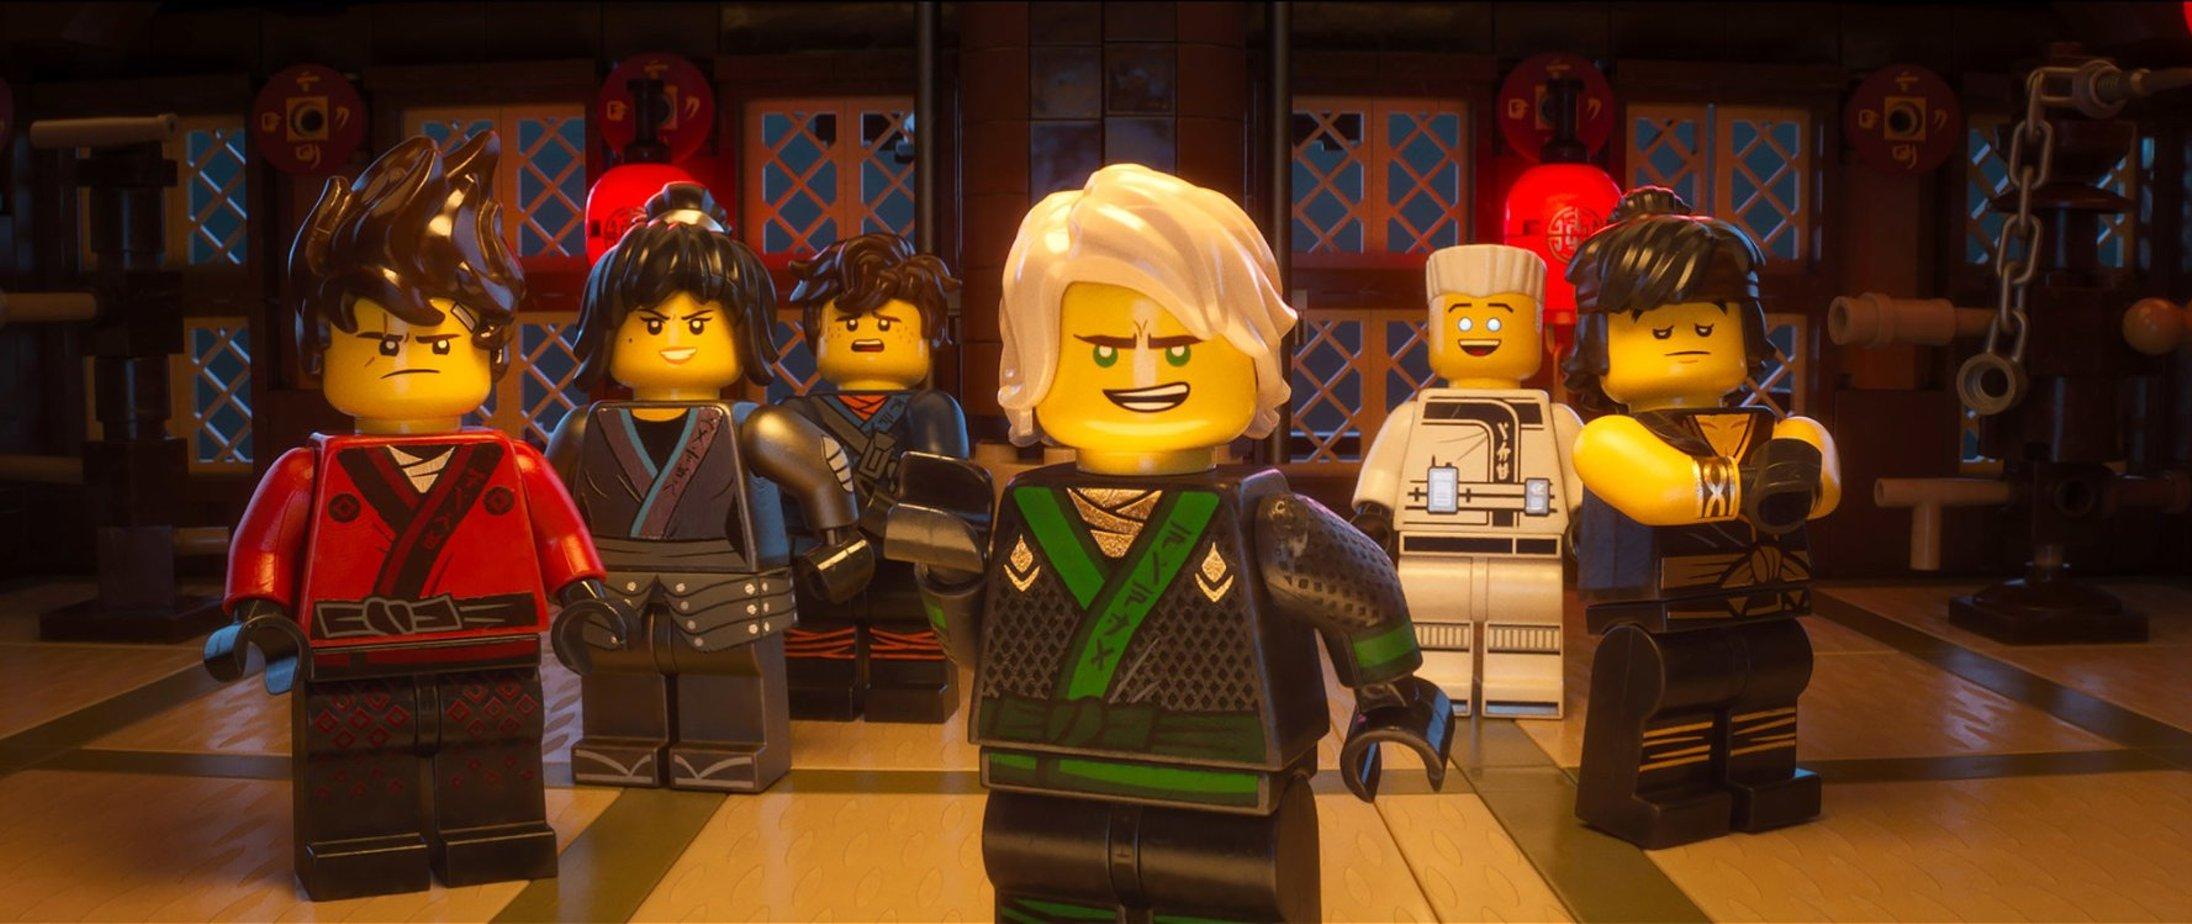 Лего фильм ниндзяго мультфильм 2018 полностью